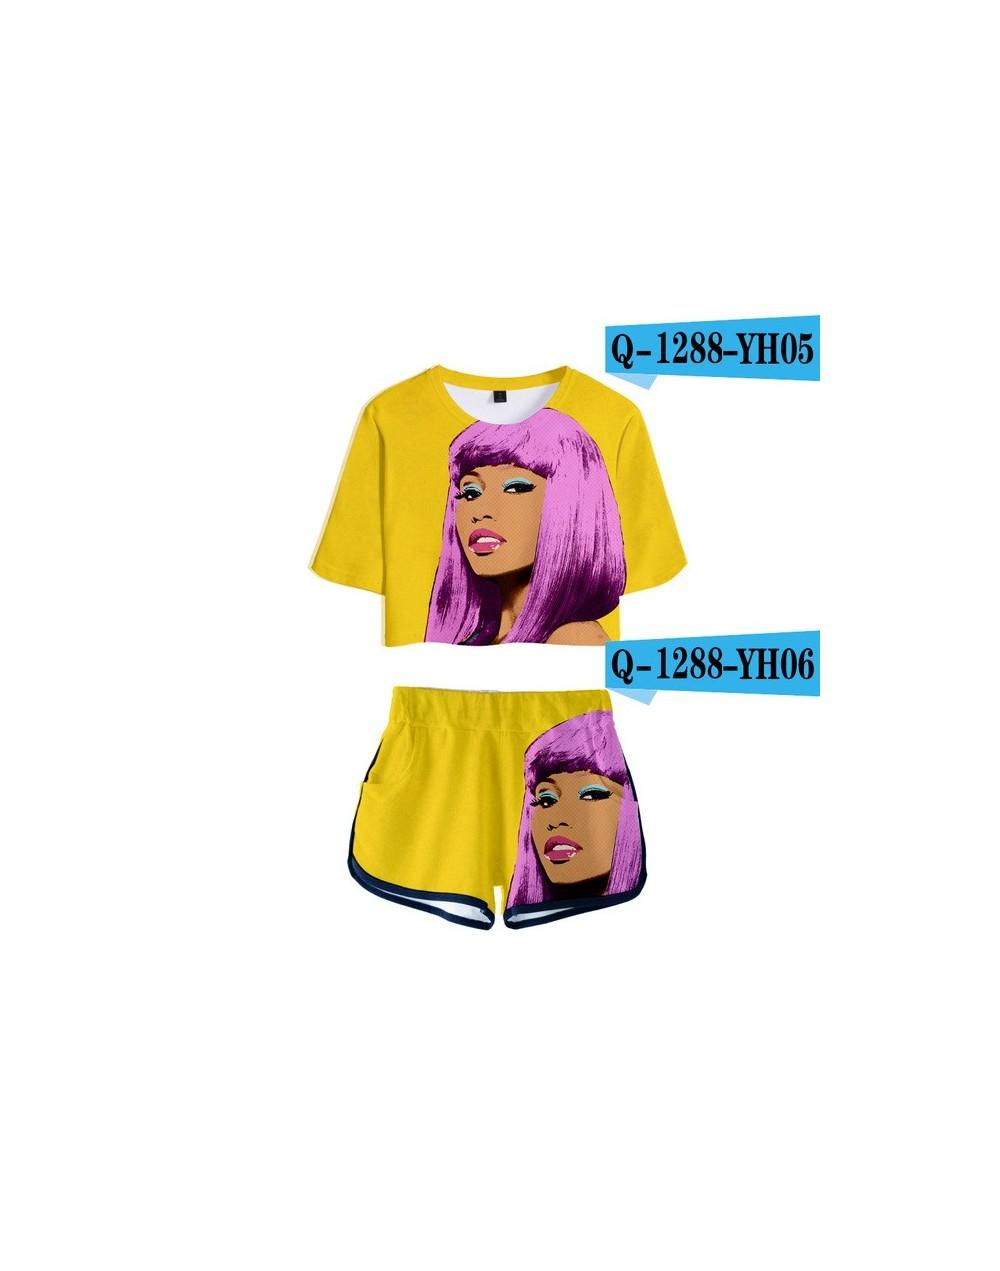 3D Pop Summer Soft Shorts And T-shirts Nicki Minaj Fashion Women Two Piece Sets Cool Print Crop Top Clothes - Dark Grey - 4J...